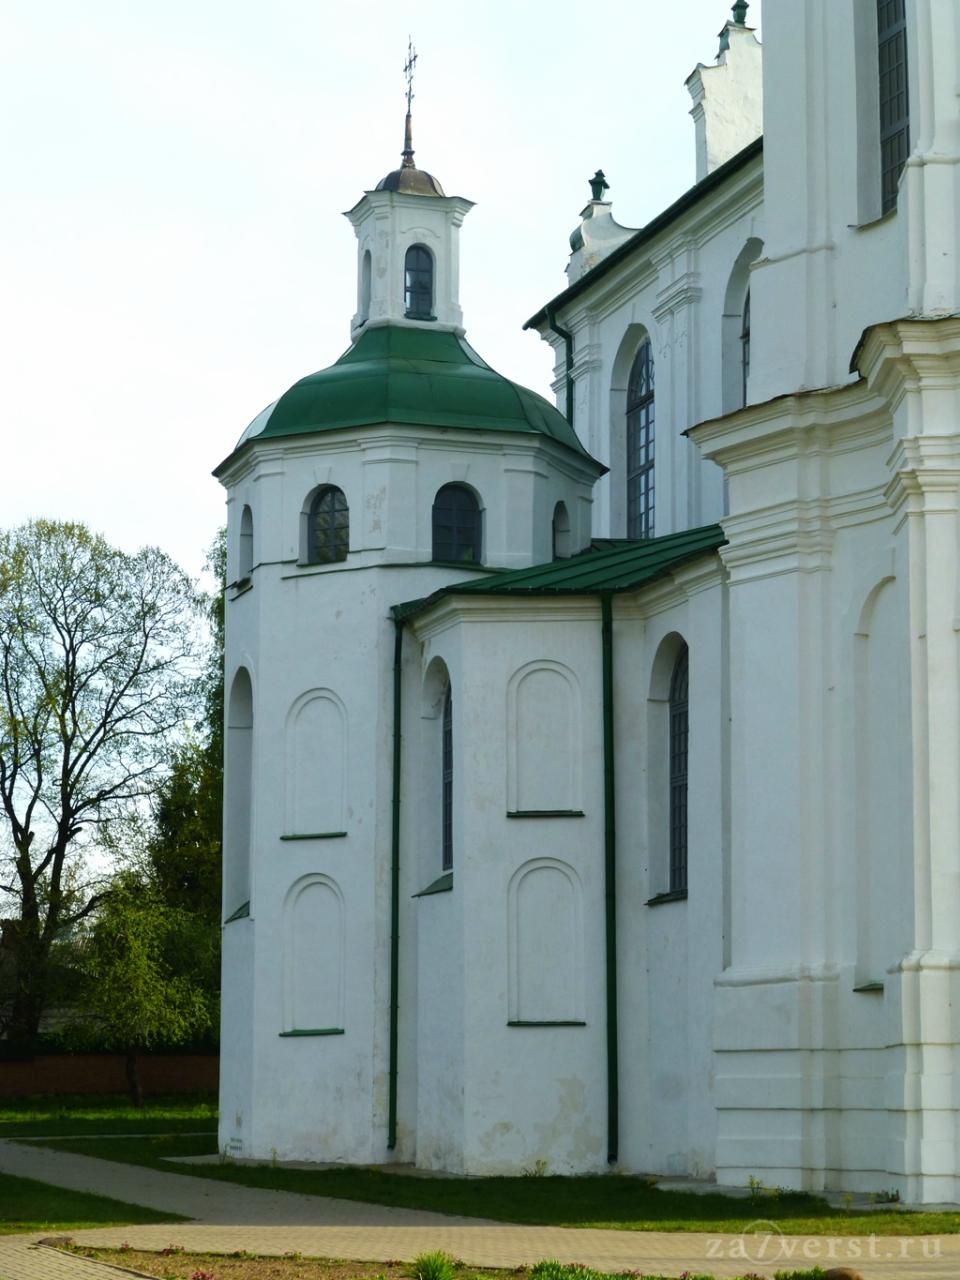 Полоцк, Белоруссия